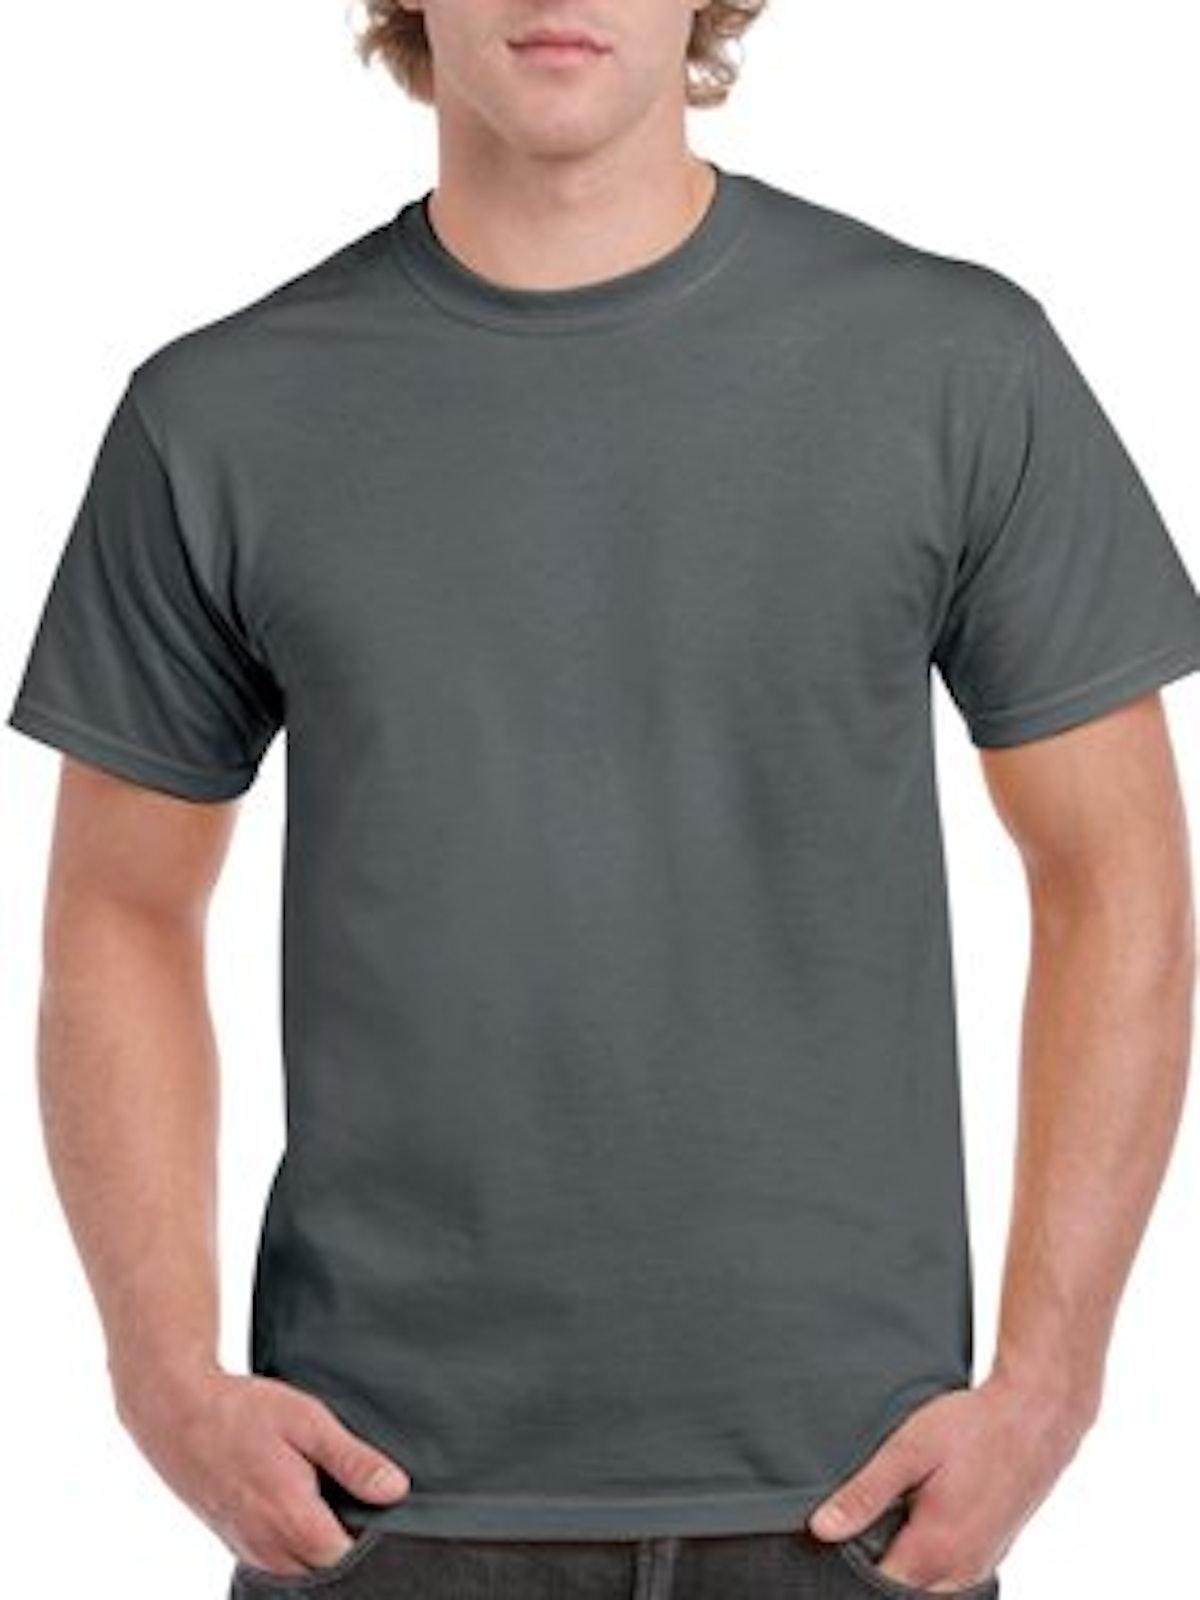 Hanes Men's EcoSmart Short Sleeve T-shirt (4-pack)